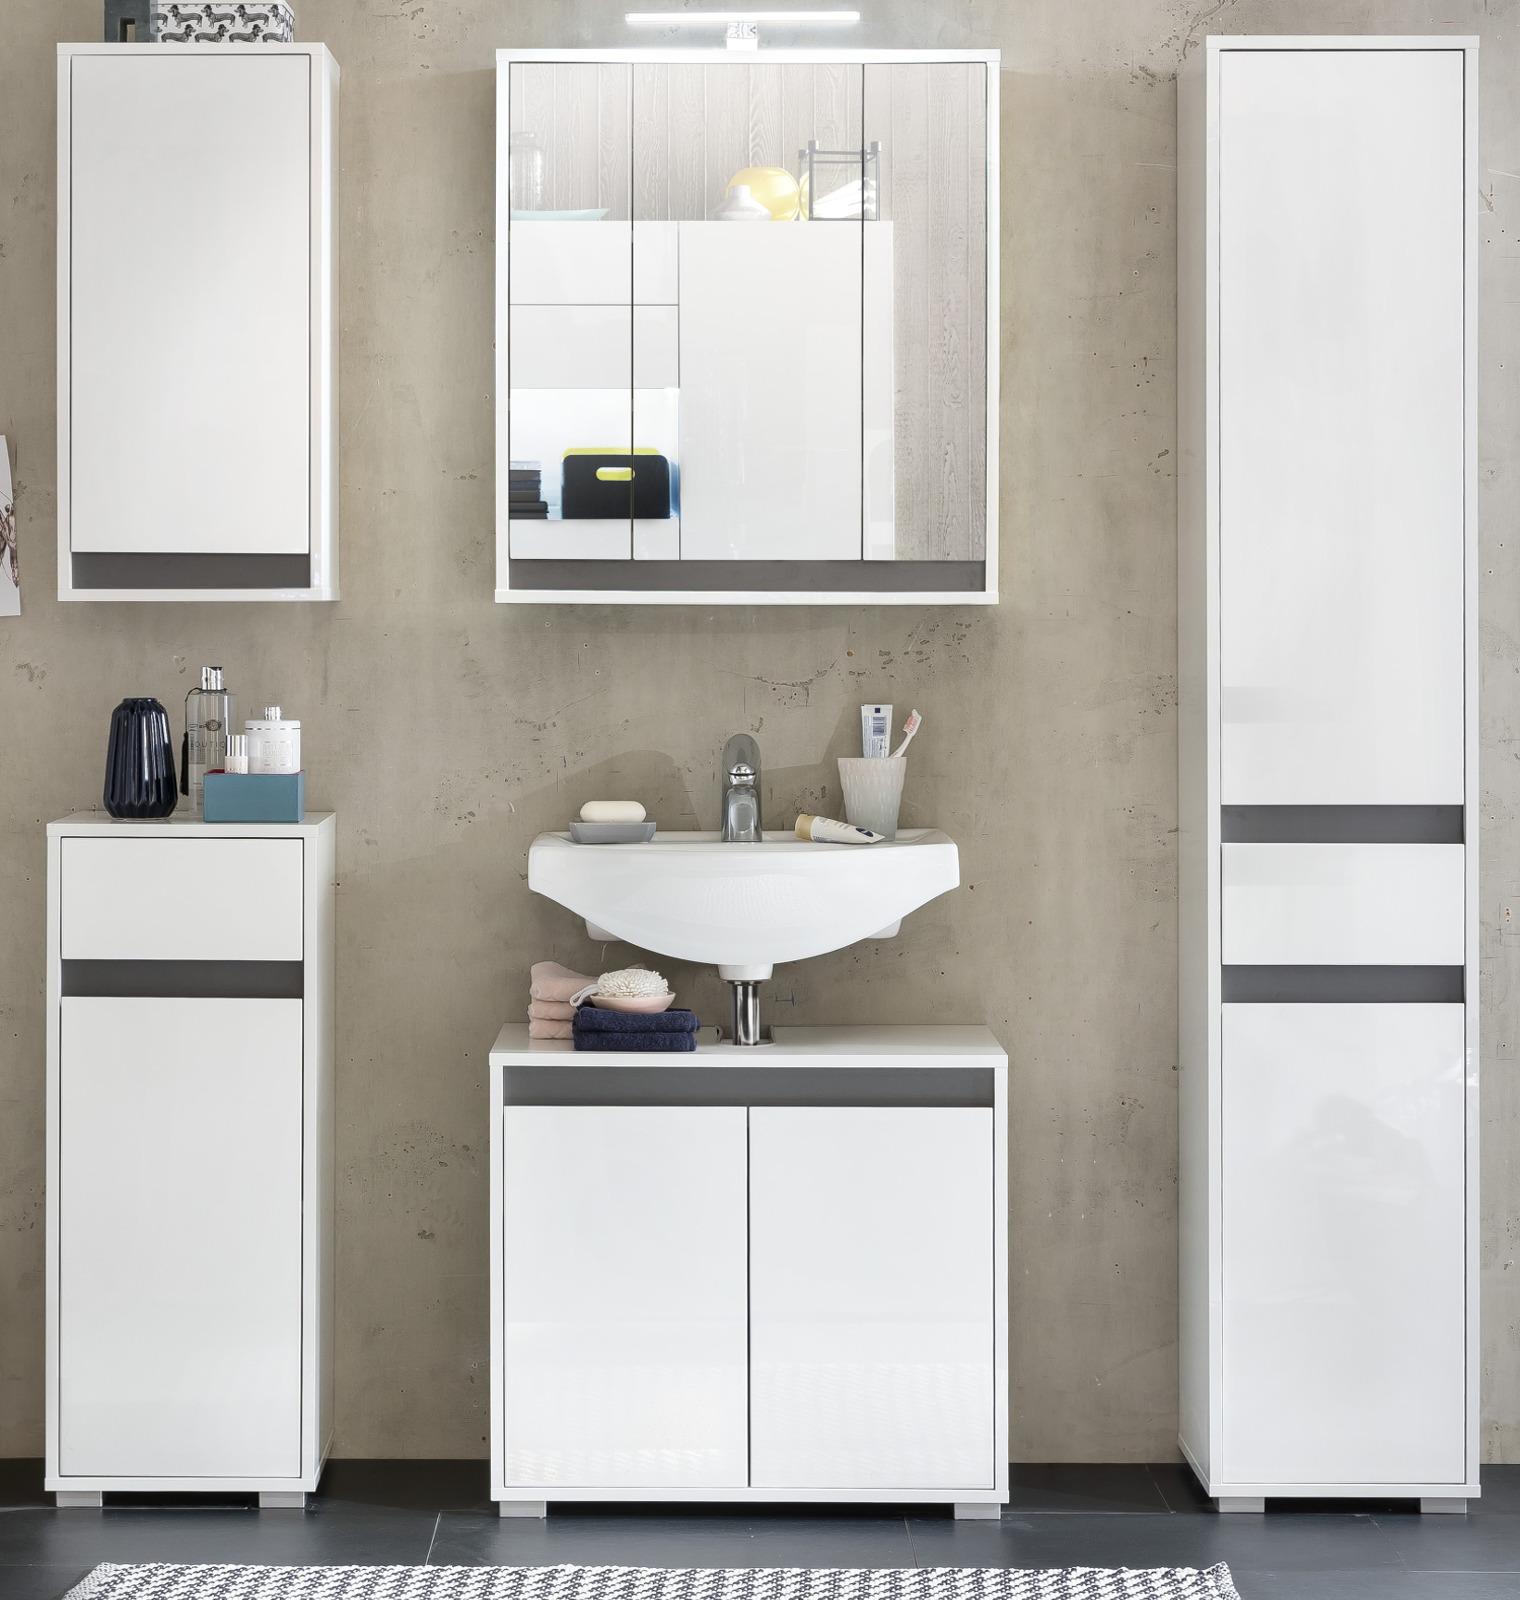 badm belset sol hochglanz wei lack und grau dekor. Black Bedroom Furniture Sets. Home Design Ideas